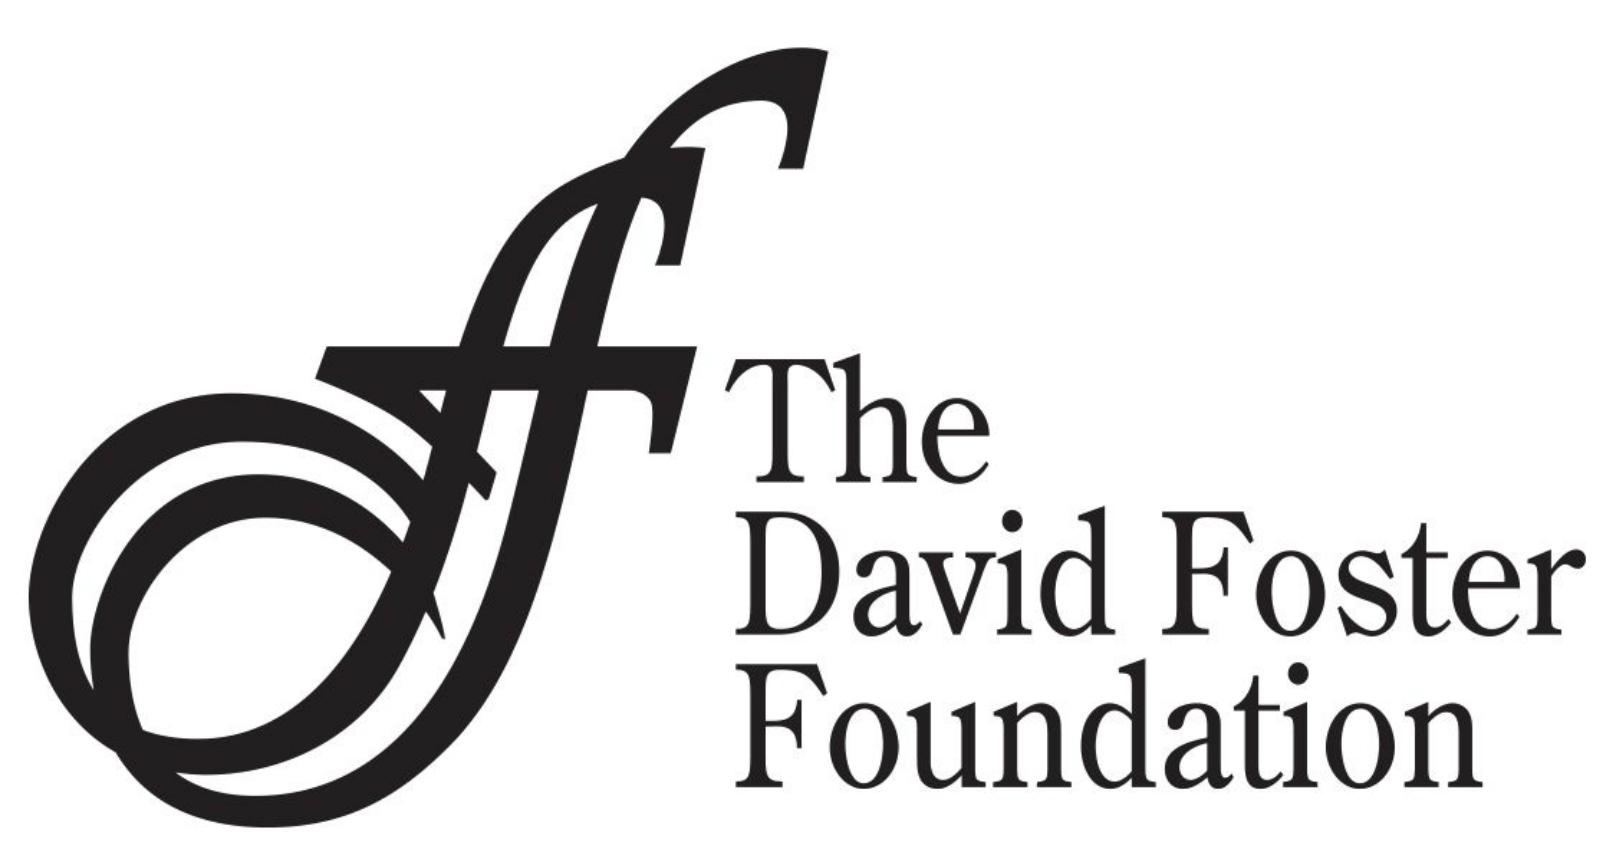 David Foster Foundation